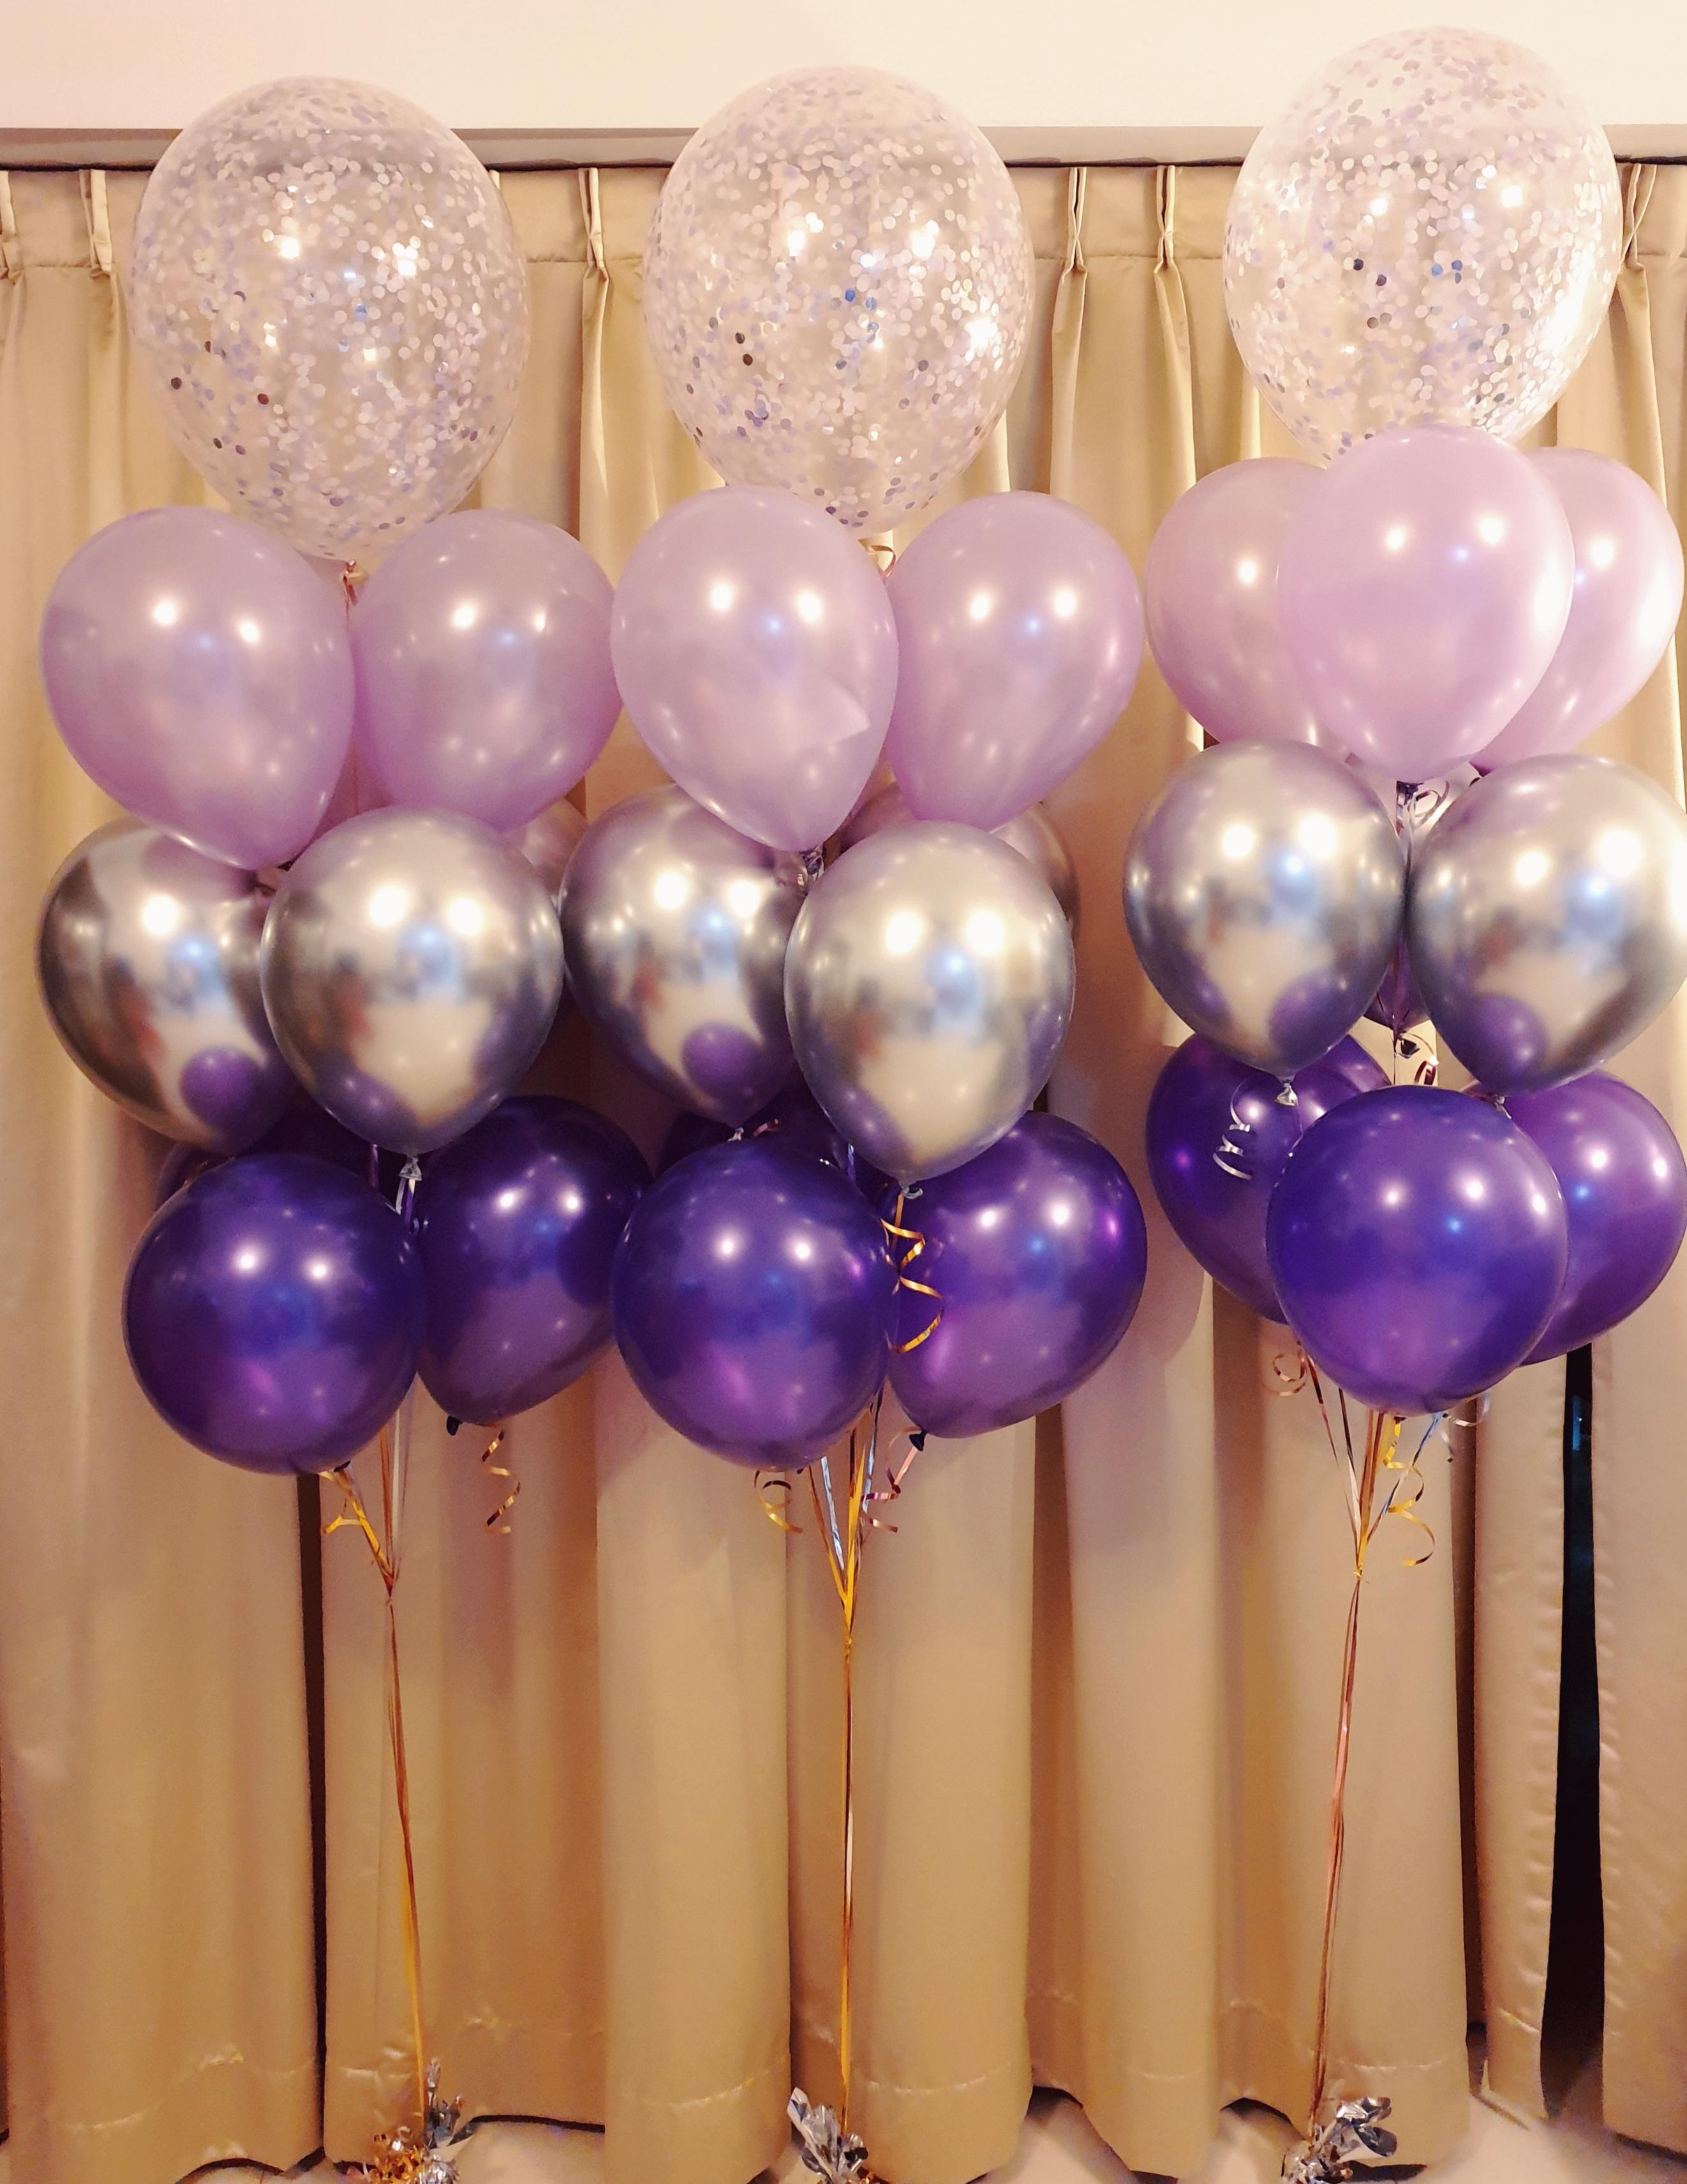 [Balloon Cluster] Tri-Tone Classic Purple series @ MR Party - Balloon Shop Singapore